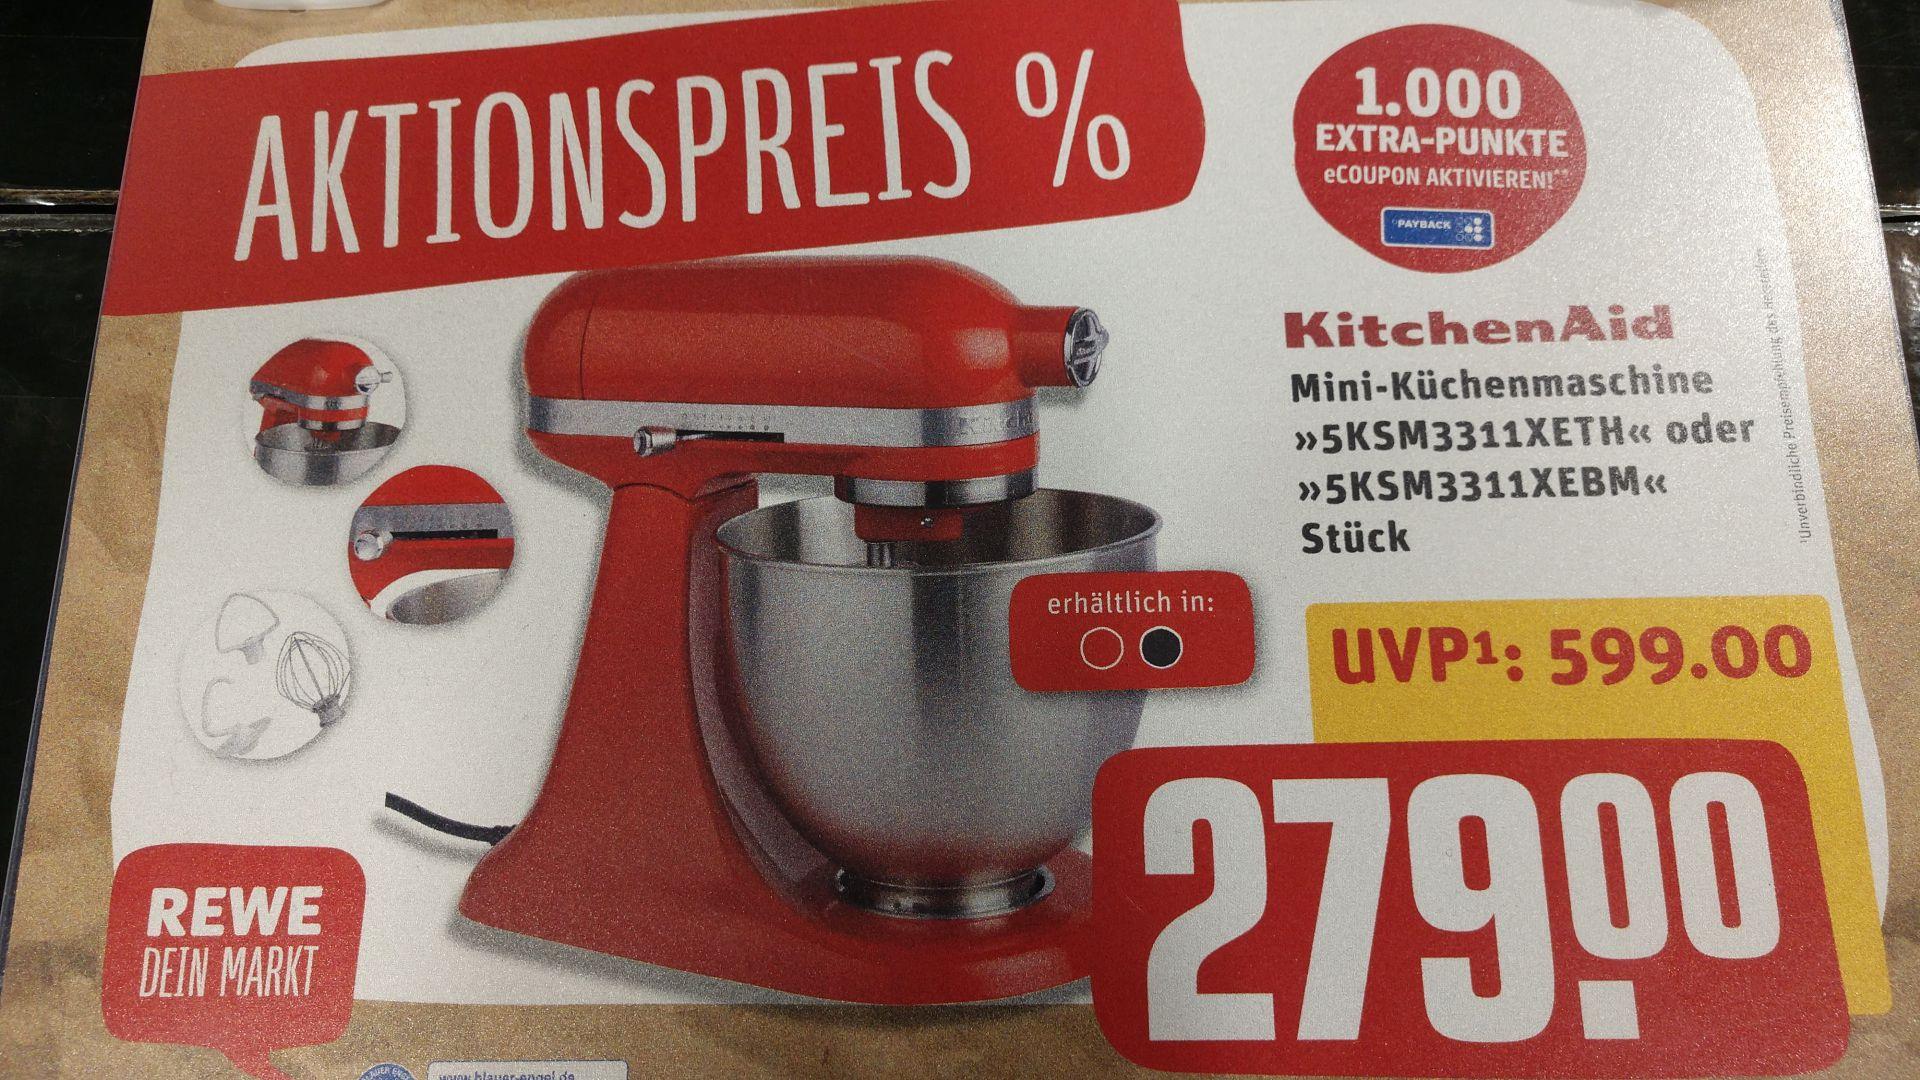 Kitchenaid Mini Kuchenmaschine Rewe Center Hanau Rondo Mydealz De